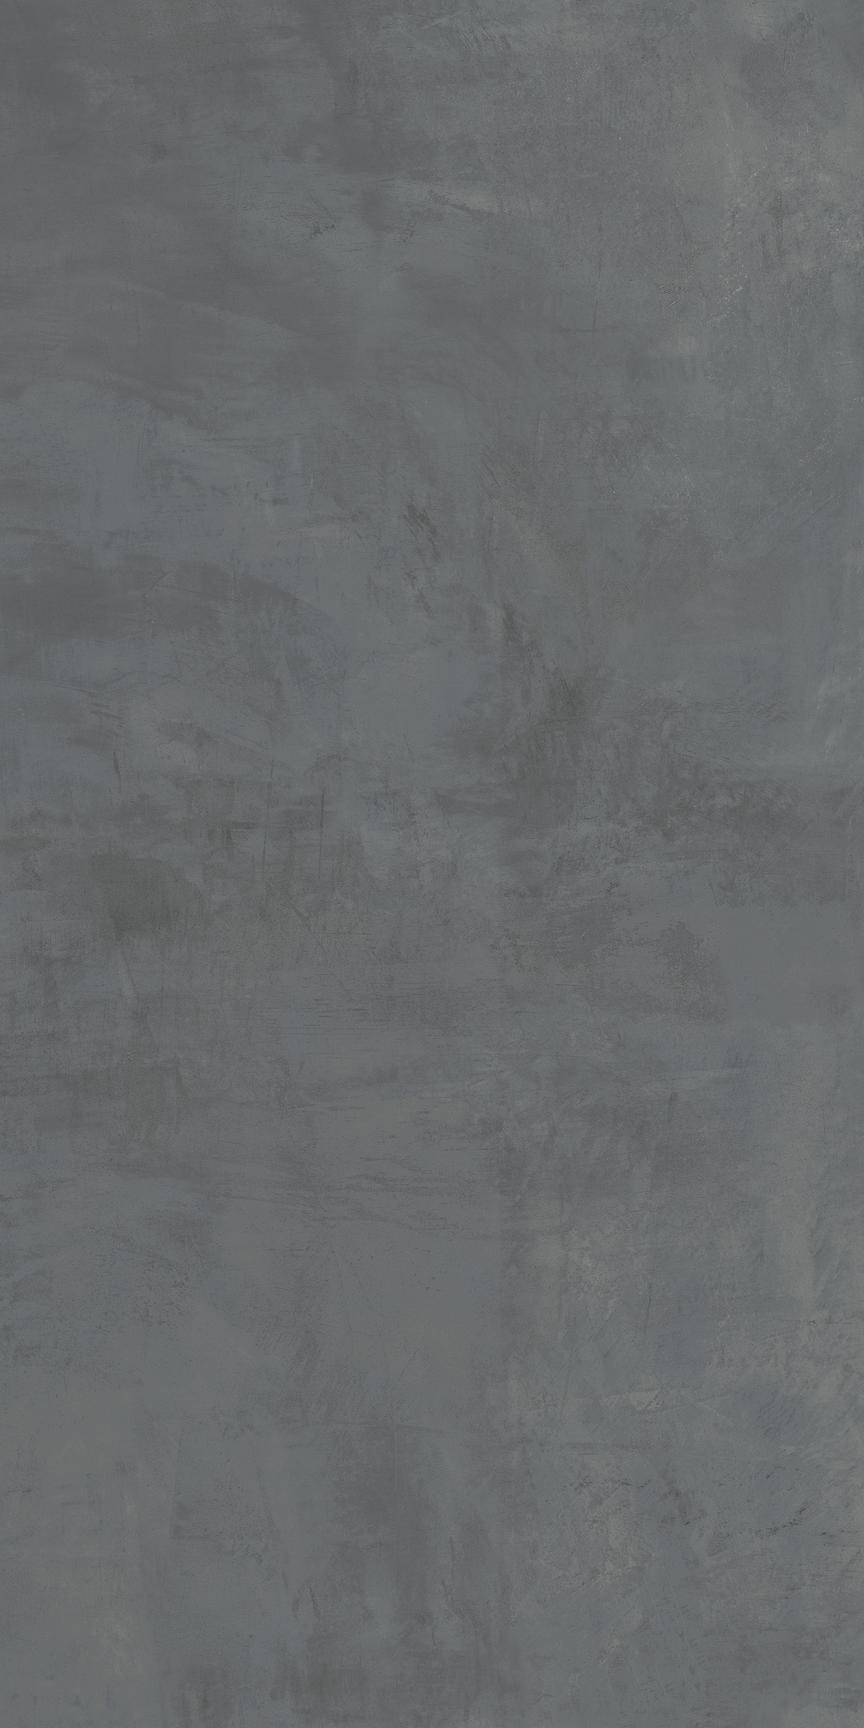 Stuyvesant Charcoal Floor/Wall Tile 24x48